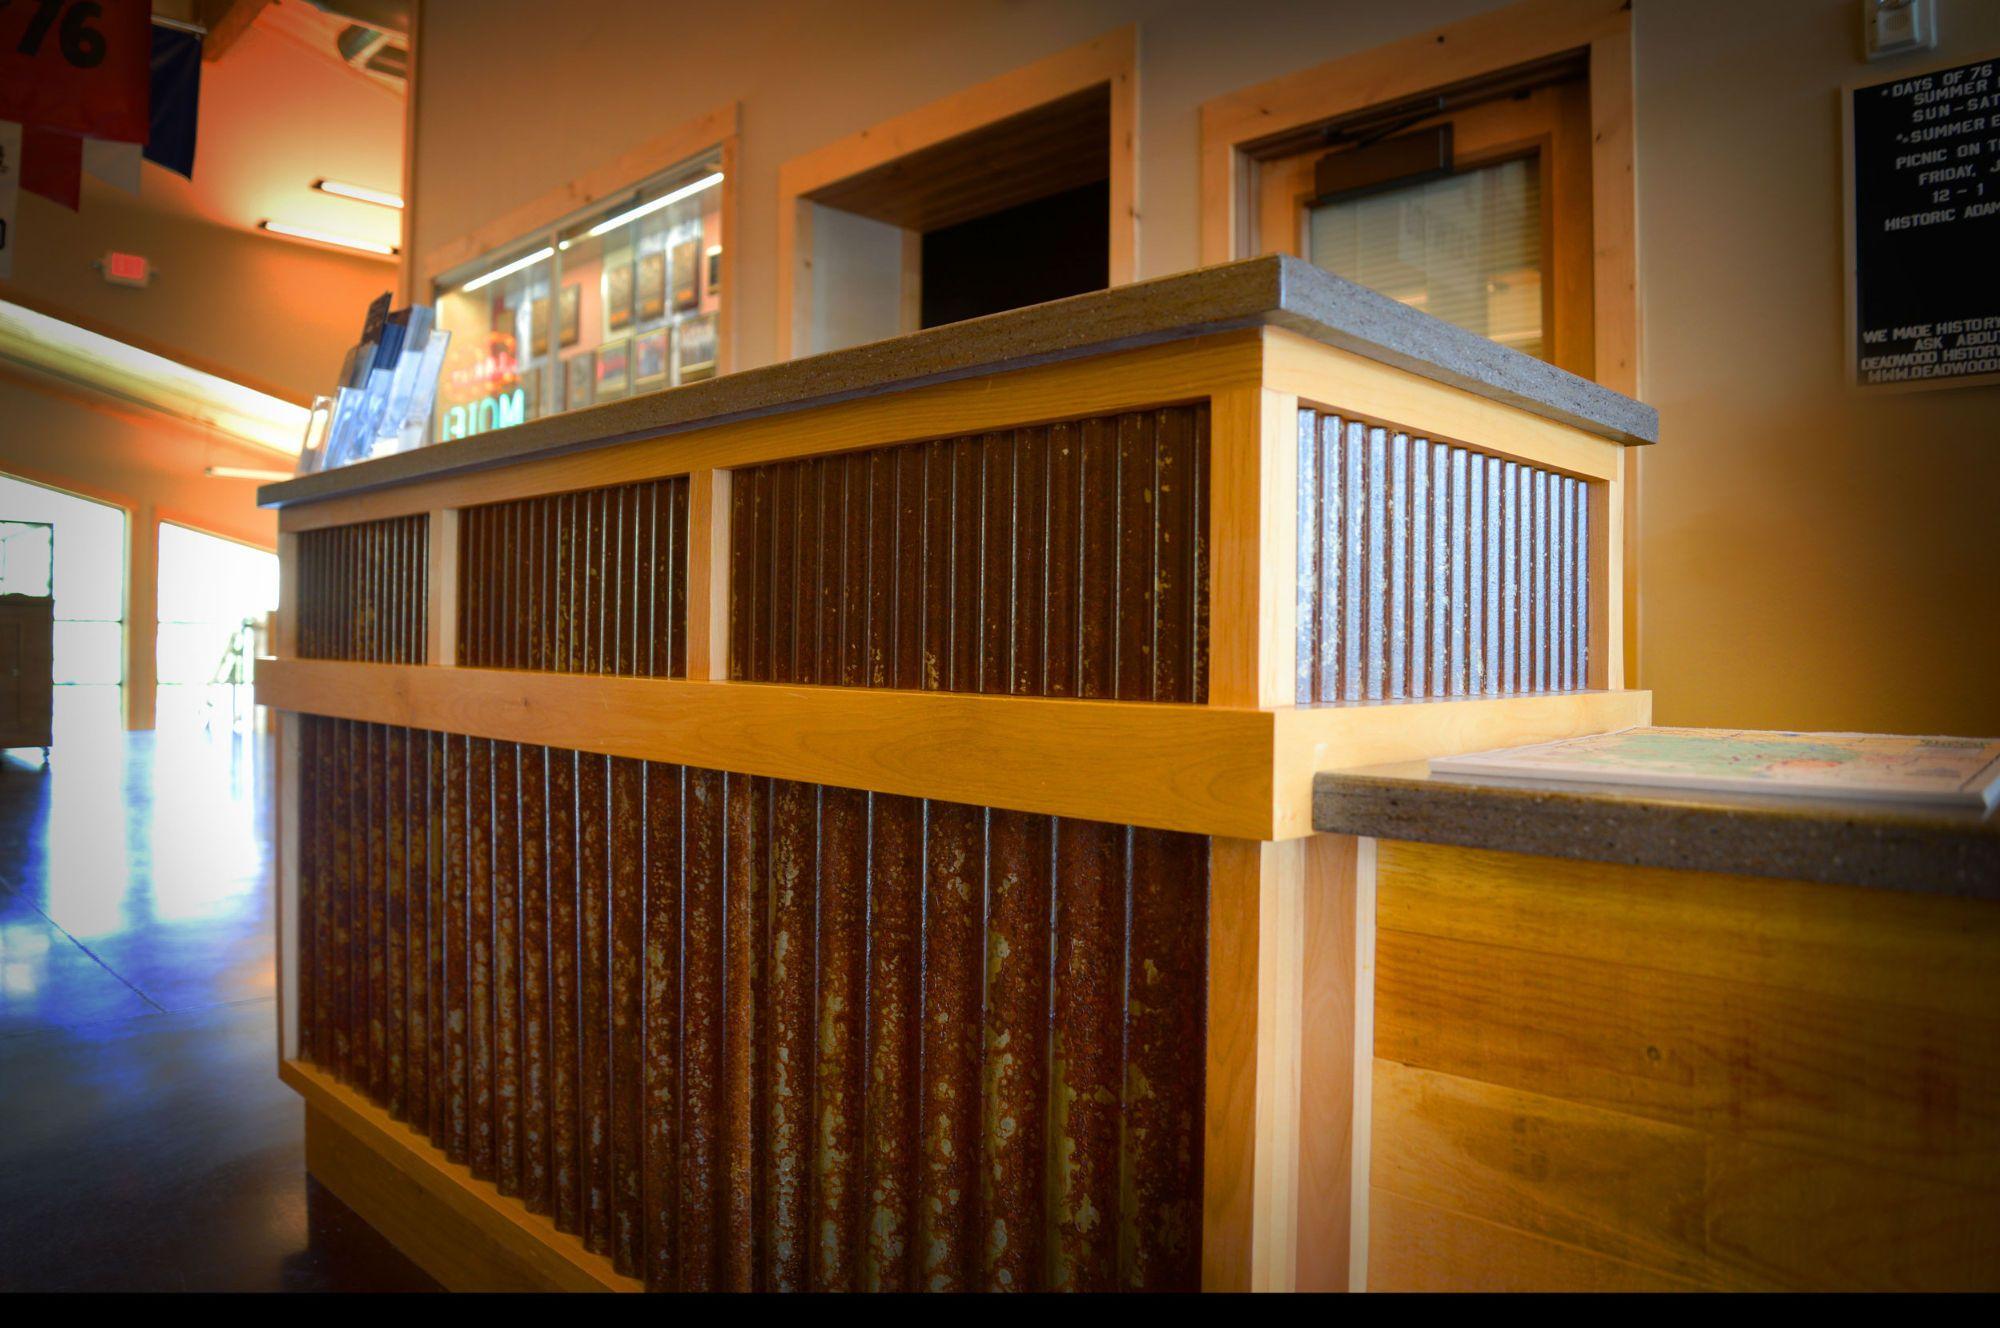 Corrugated Metal Siding For Interiors Home Design Decor Basement Design Metal Roof Panels